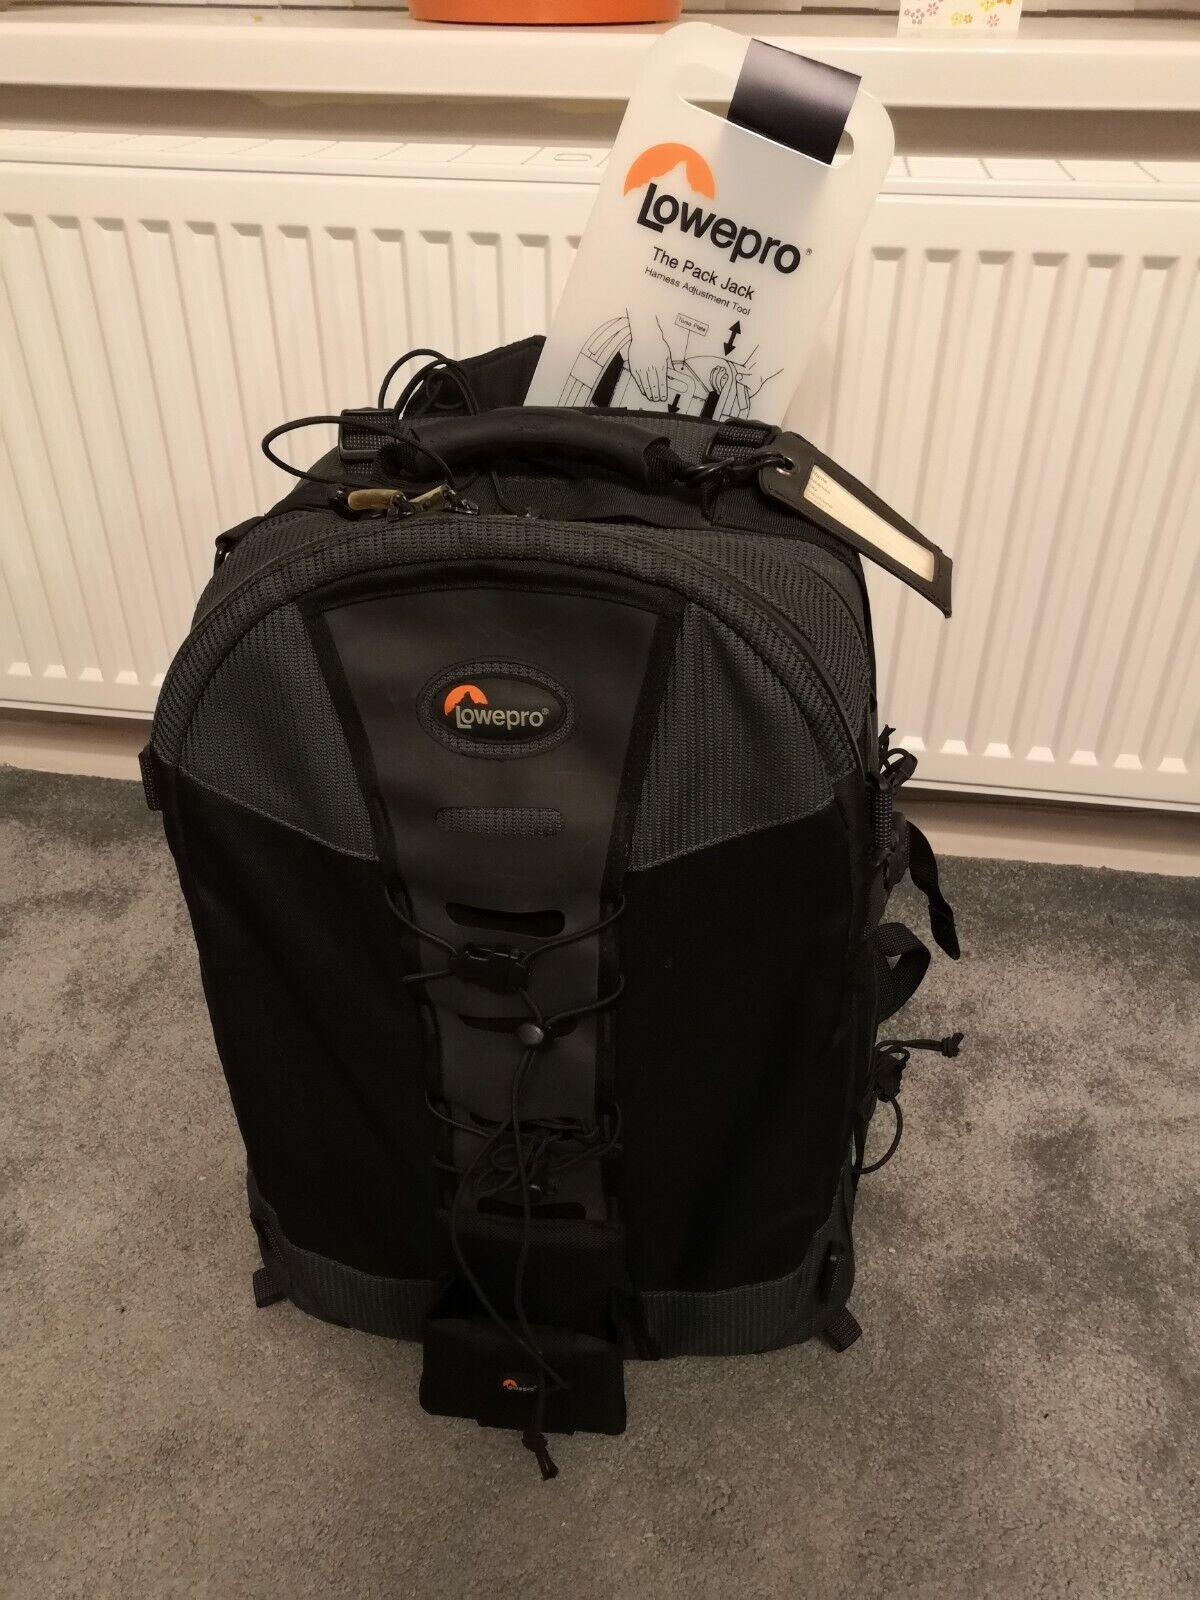 Lowepro Trekker AW II - Photography Camera Backpack Rucksack Bag